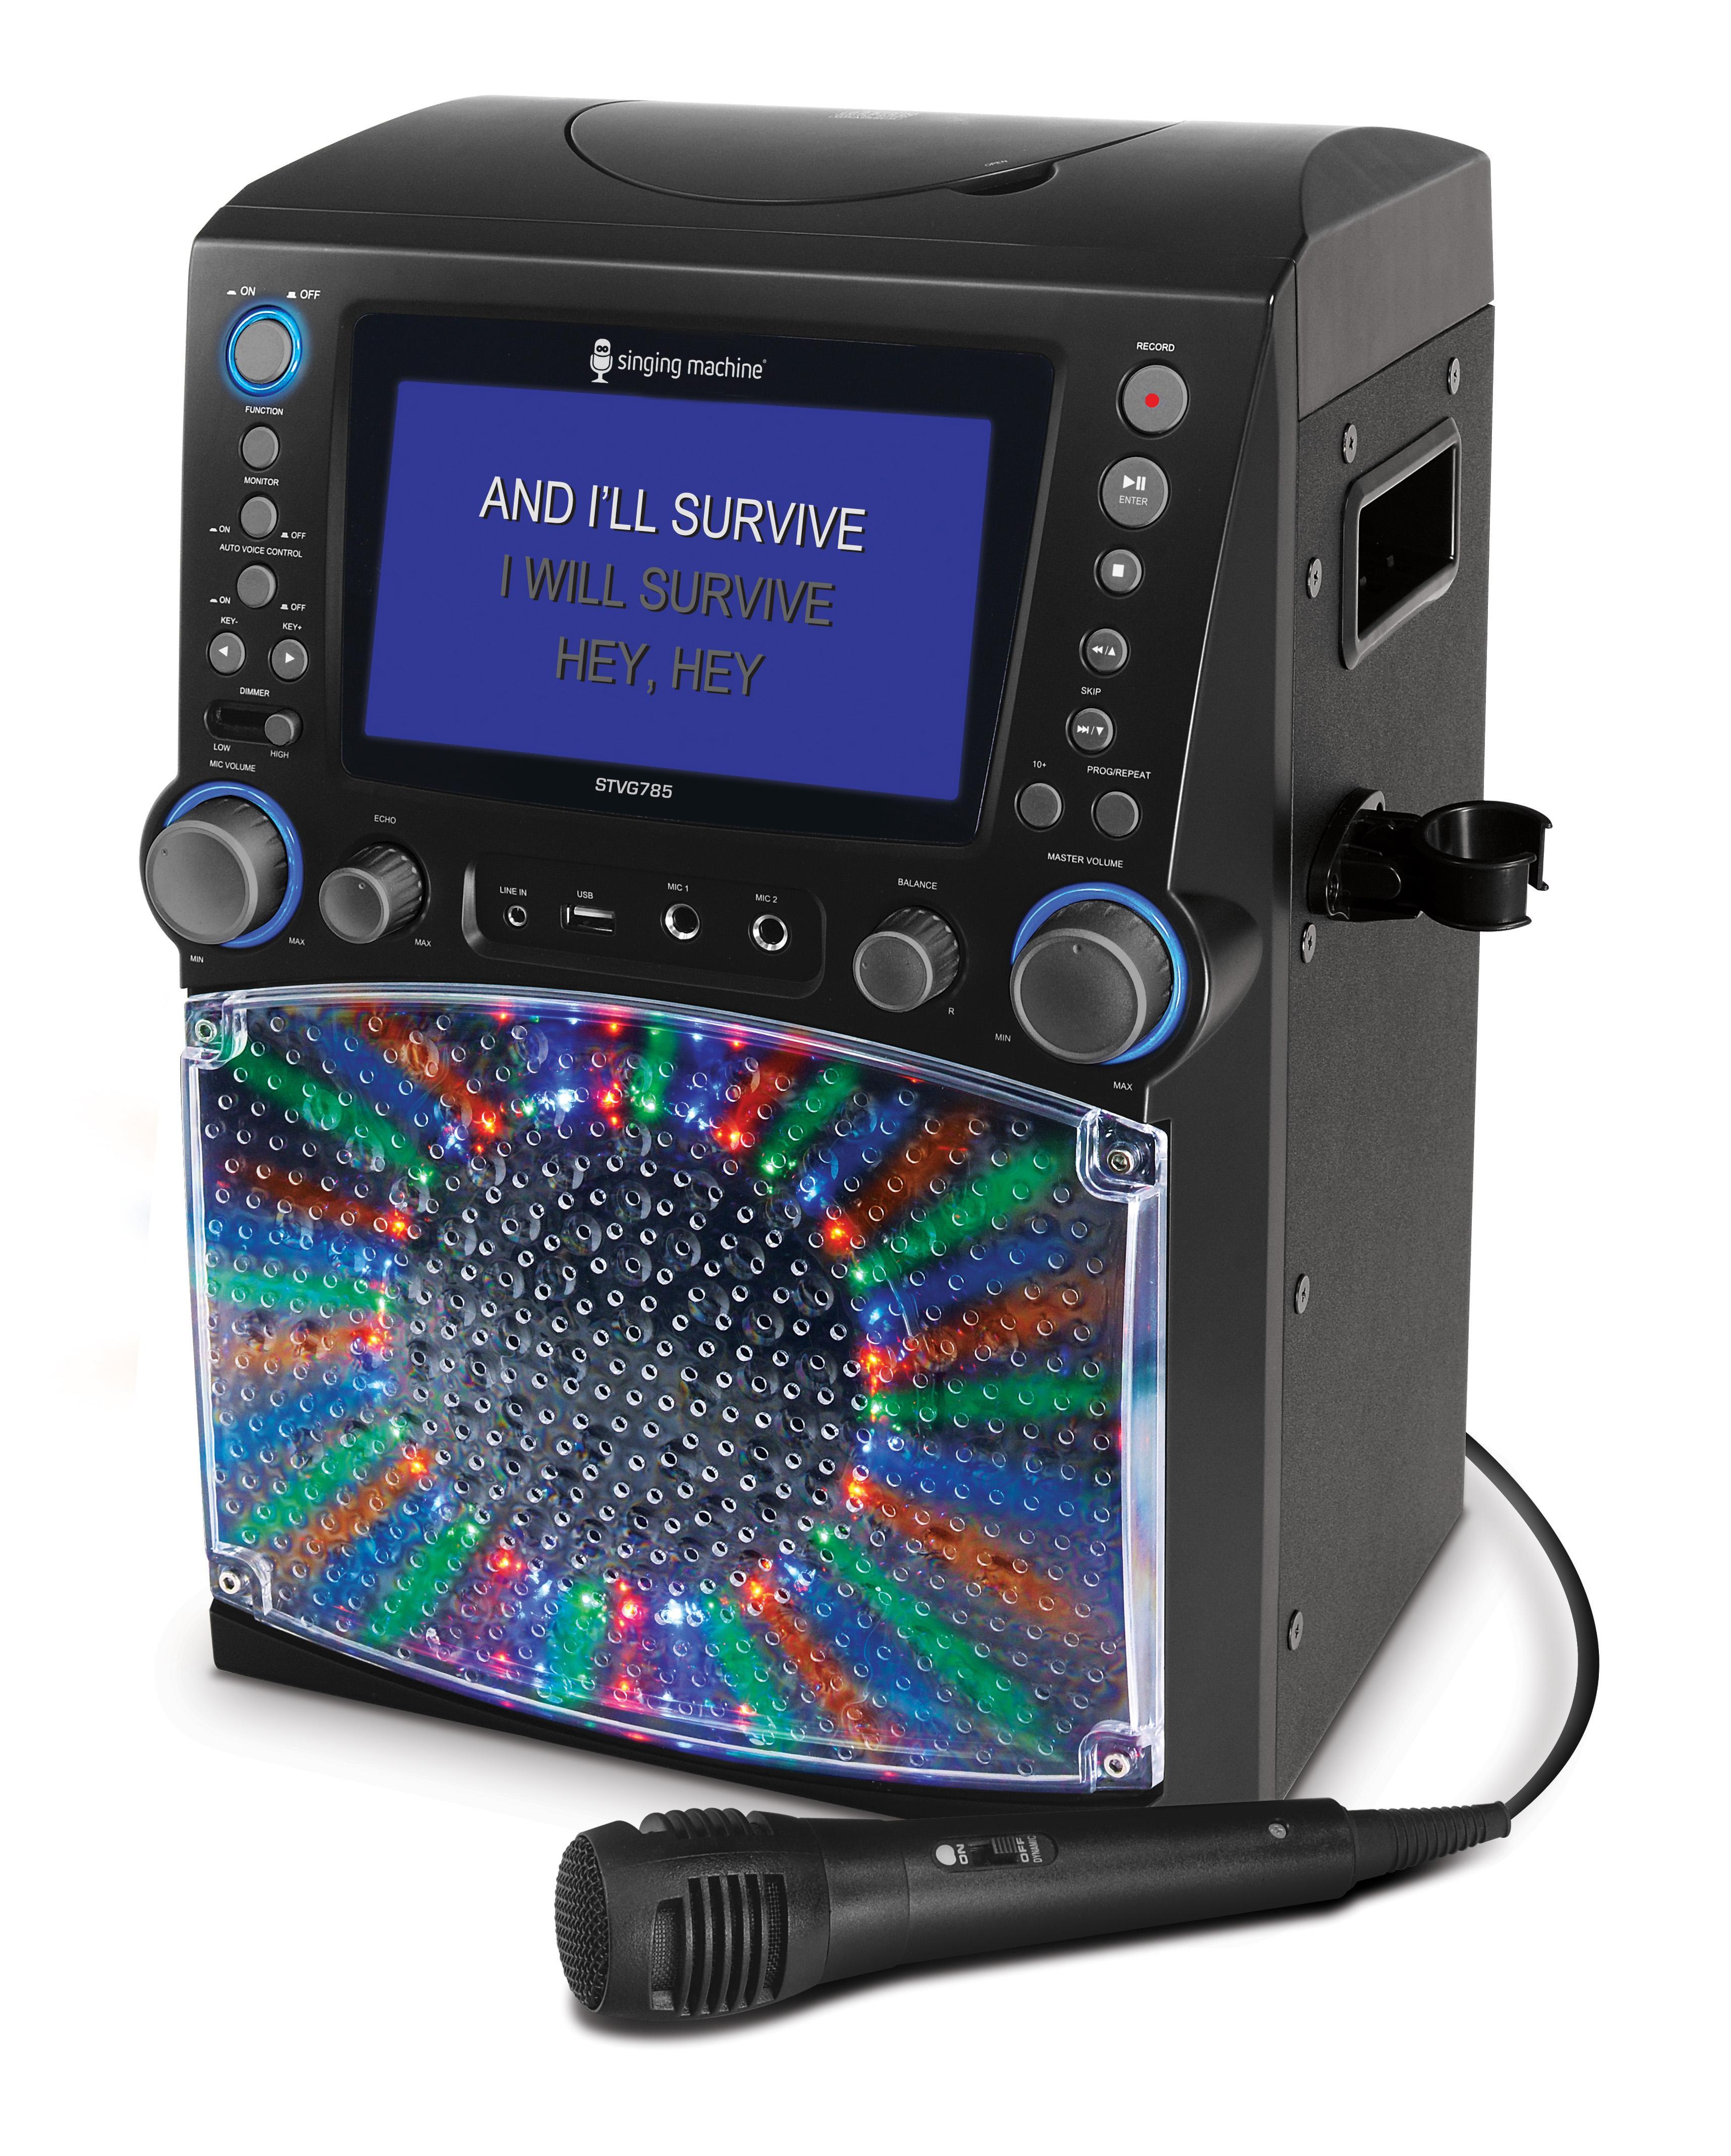 Singing Machine Stvg785bk Karaoke Machine Black Amazon